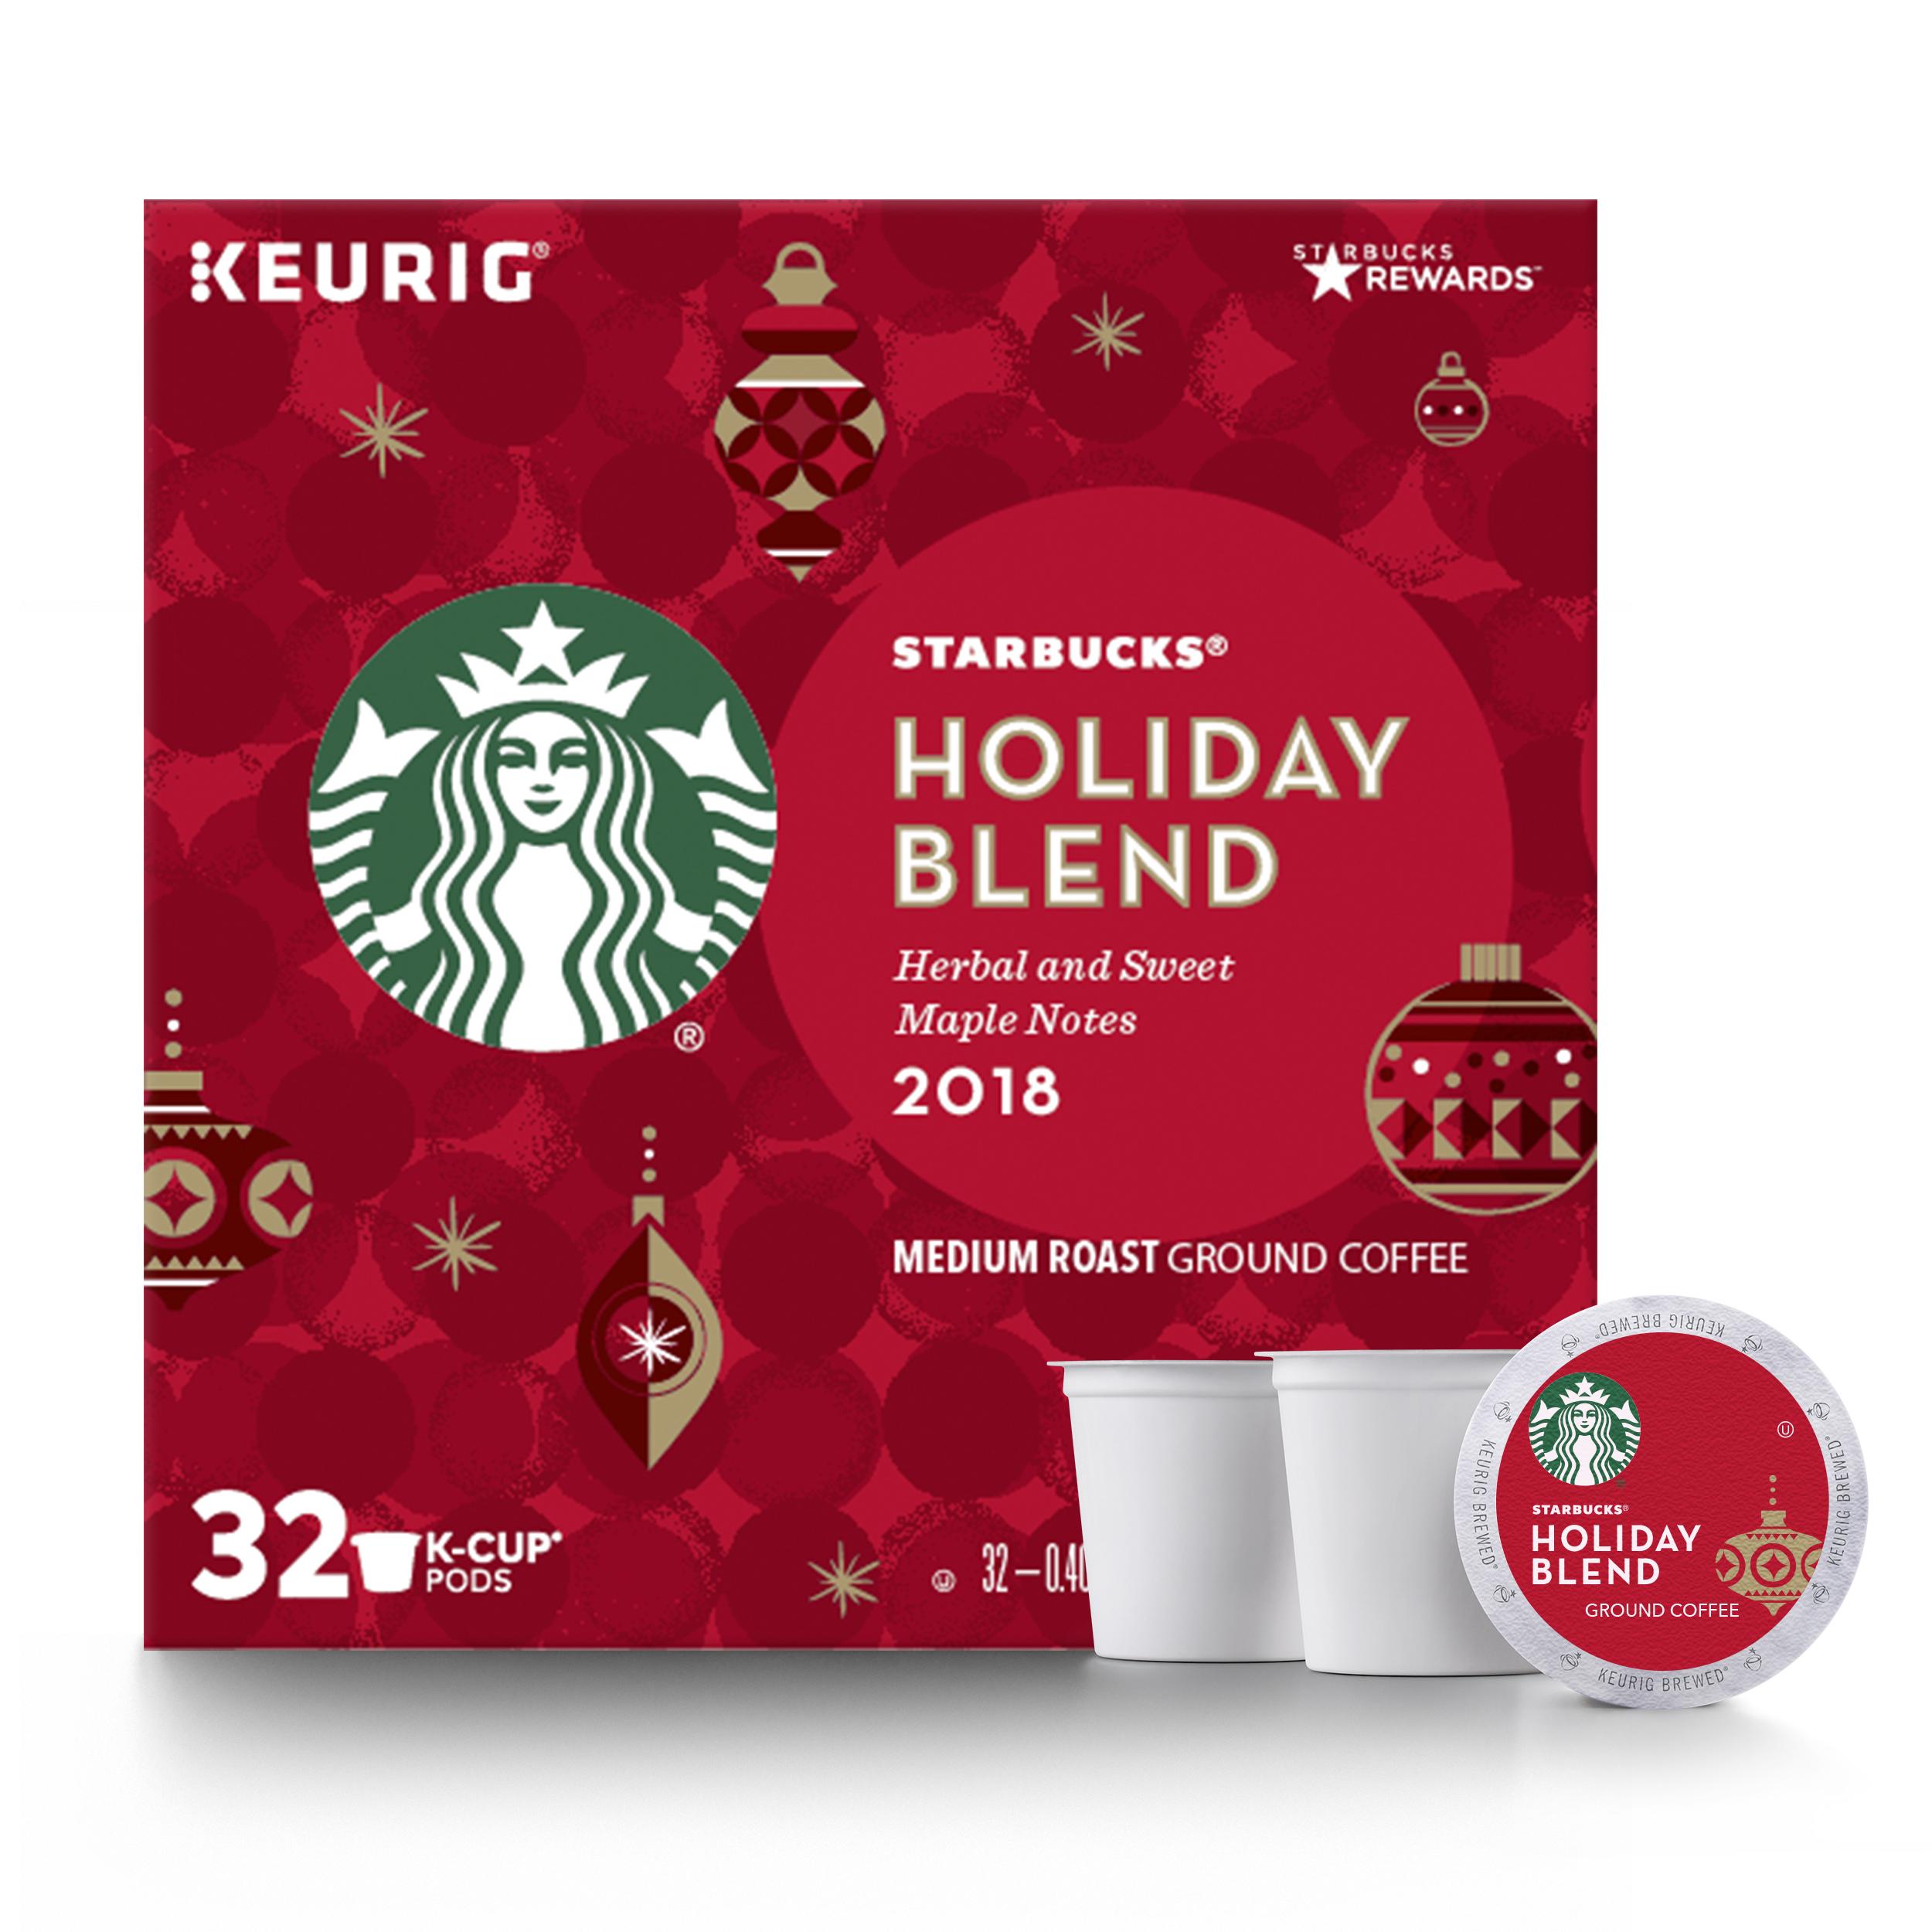 Starbucks Holiday Blend 2018 Coffee Pods, Medium Roast, 32 Count Box